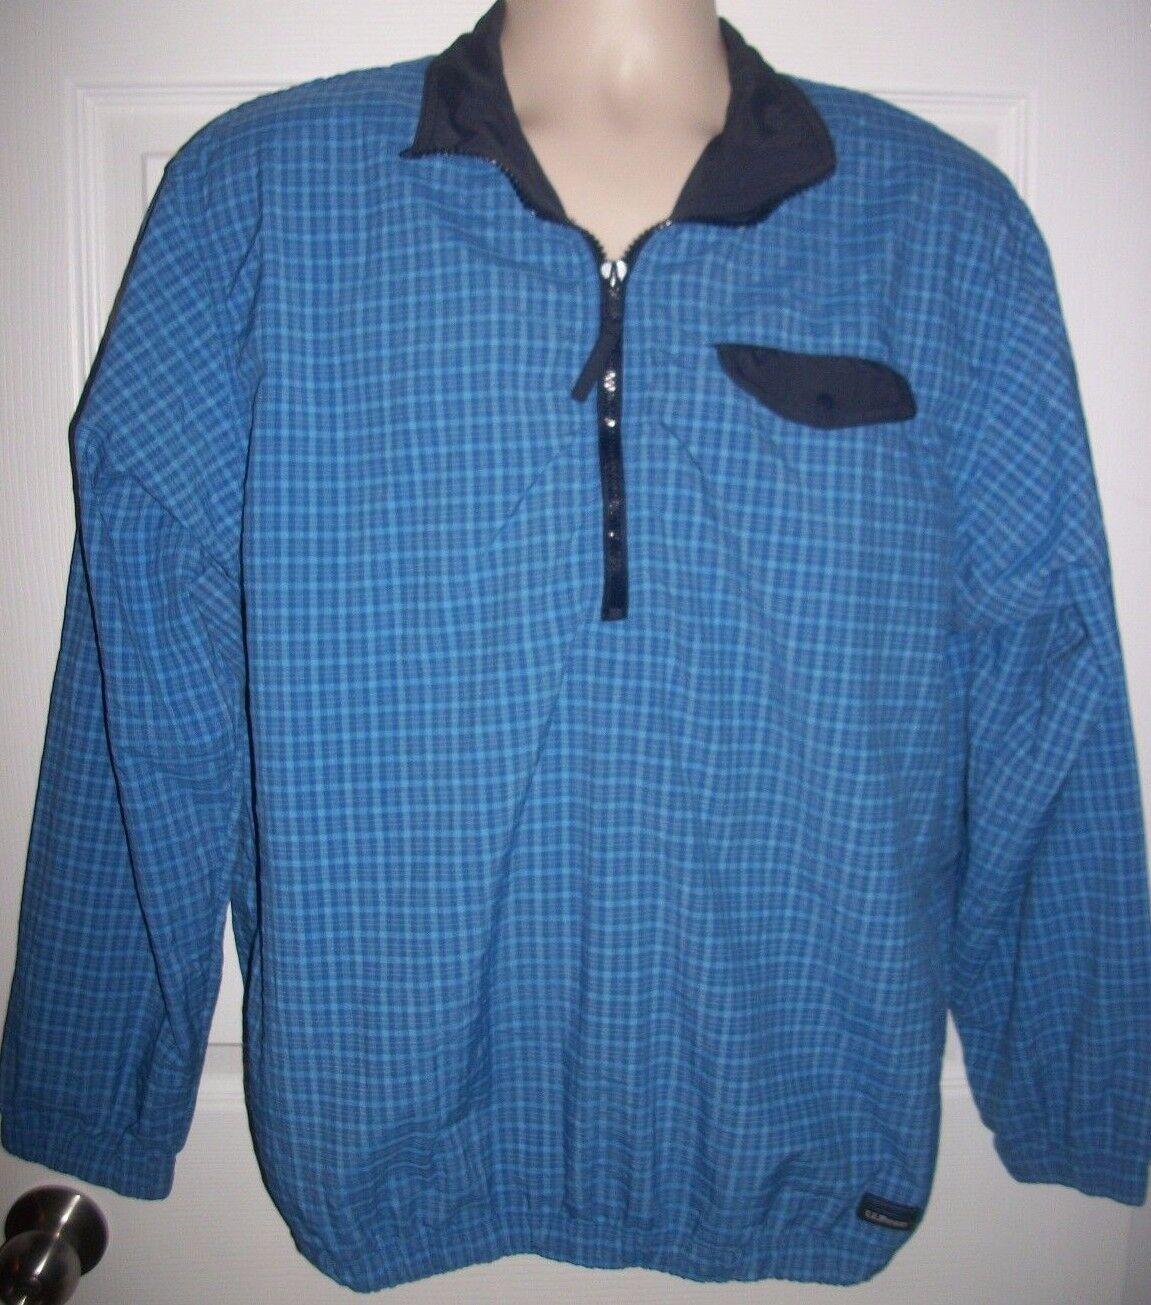 L. L. Bean Men's bluee Plaid Nylon Blend Sport Shirt Size XL